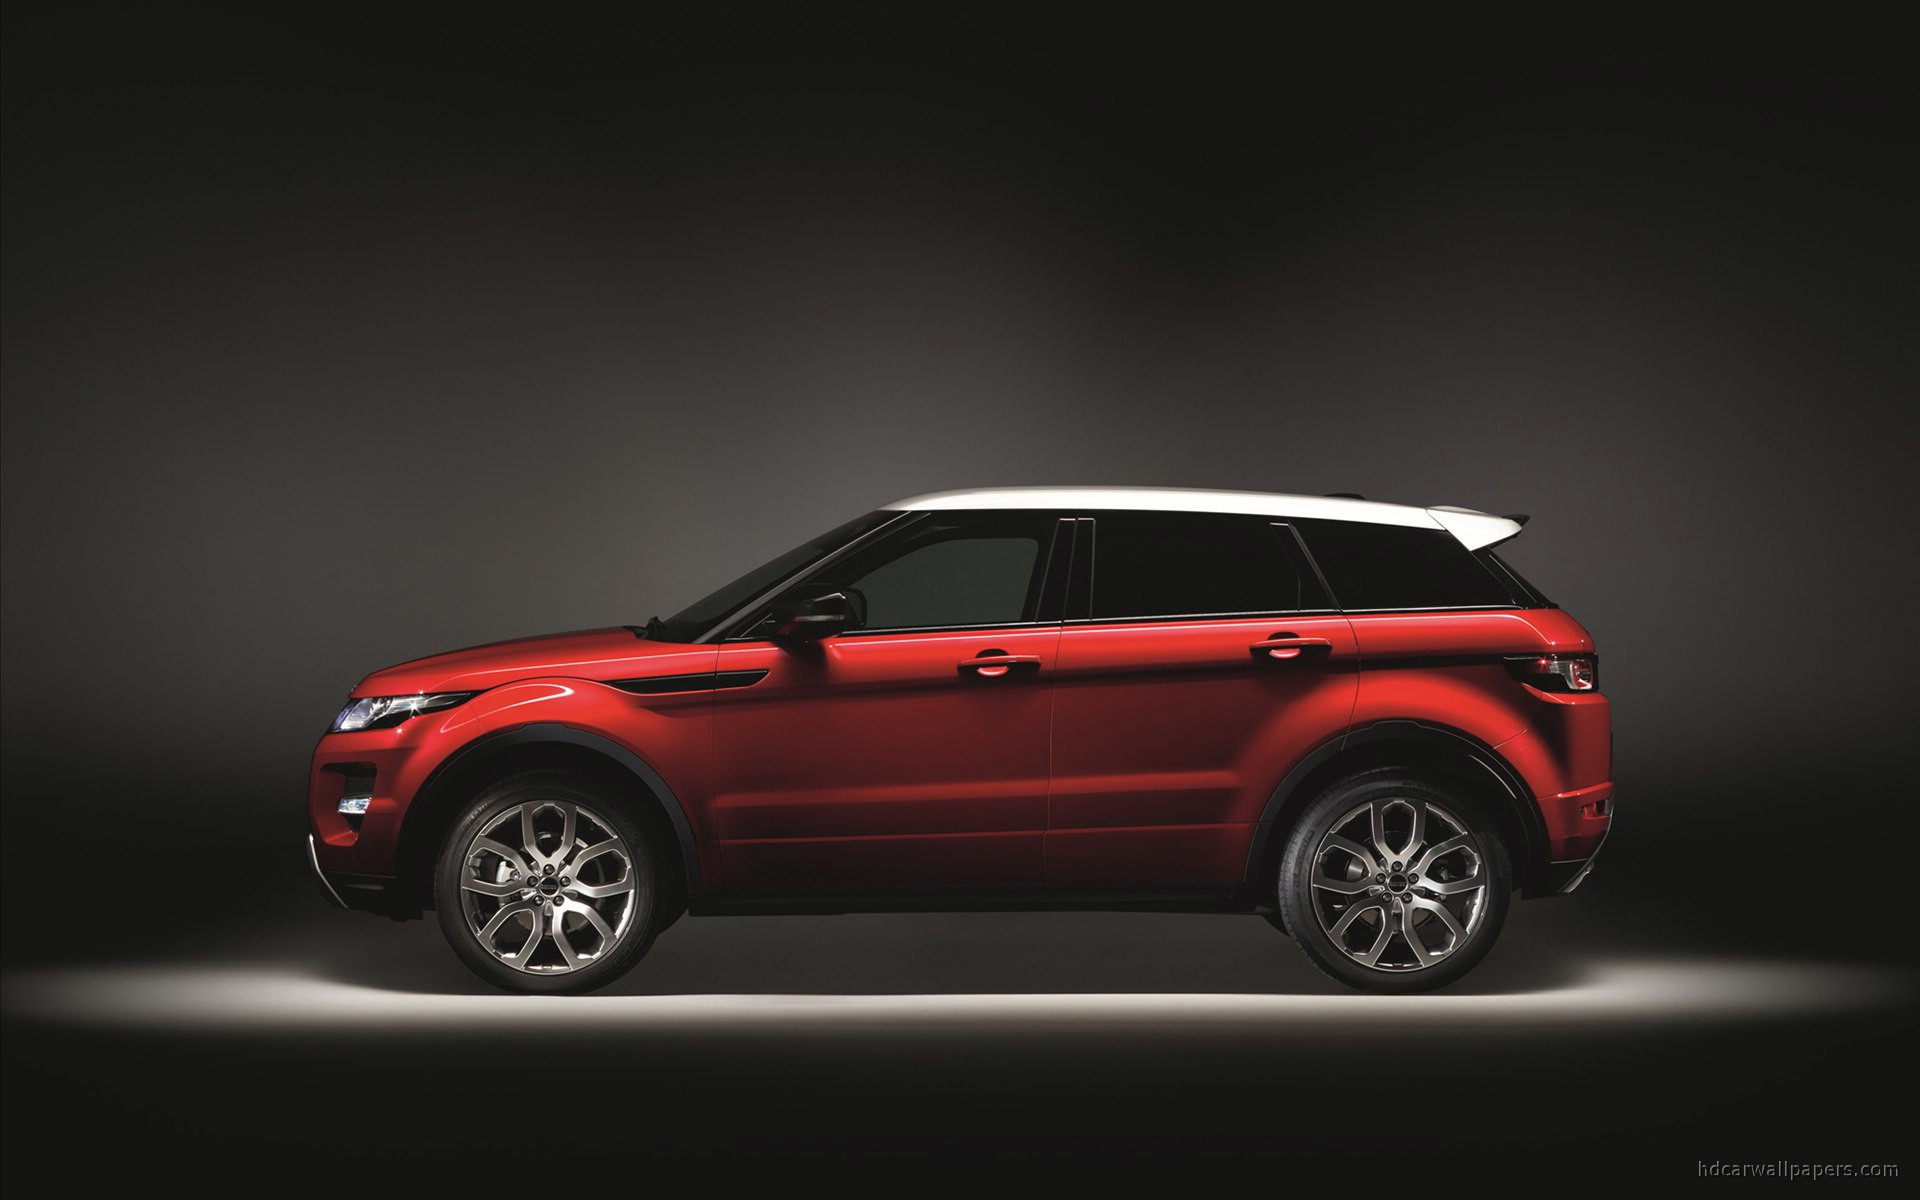 Dynamic Wallpaper Iphone X 2012 Range Rover Evoque 3 Wallpaper Hd Car Wallpapers